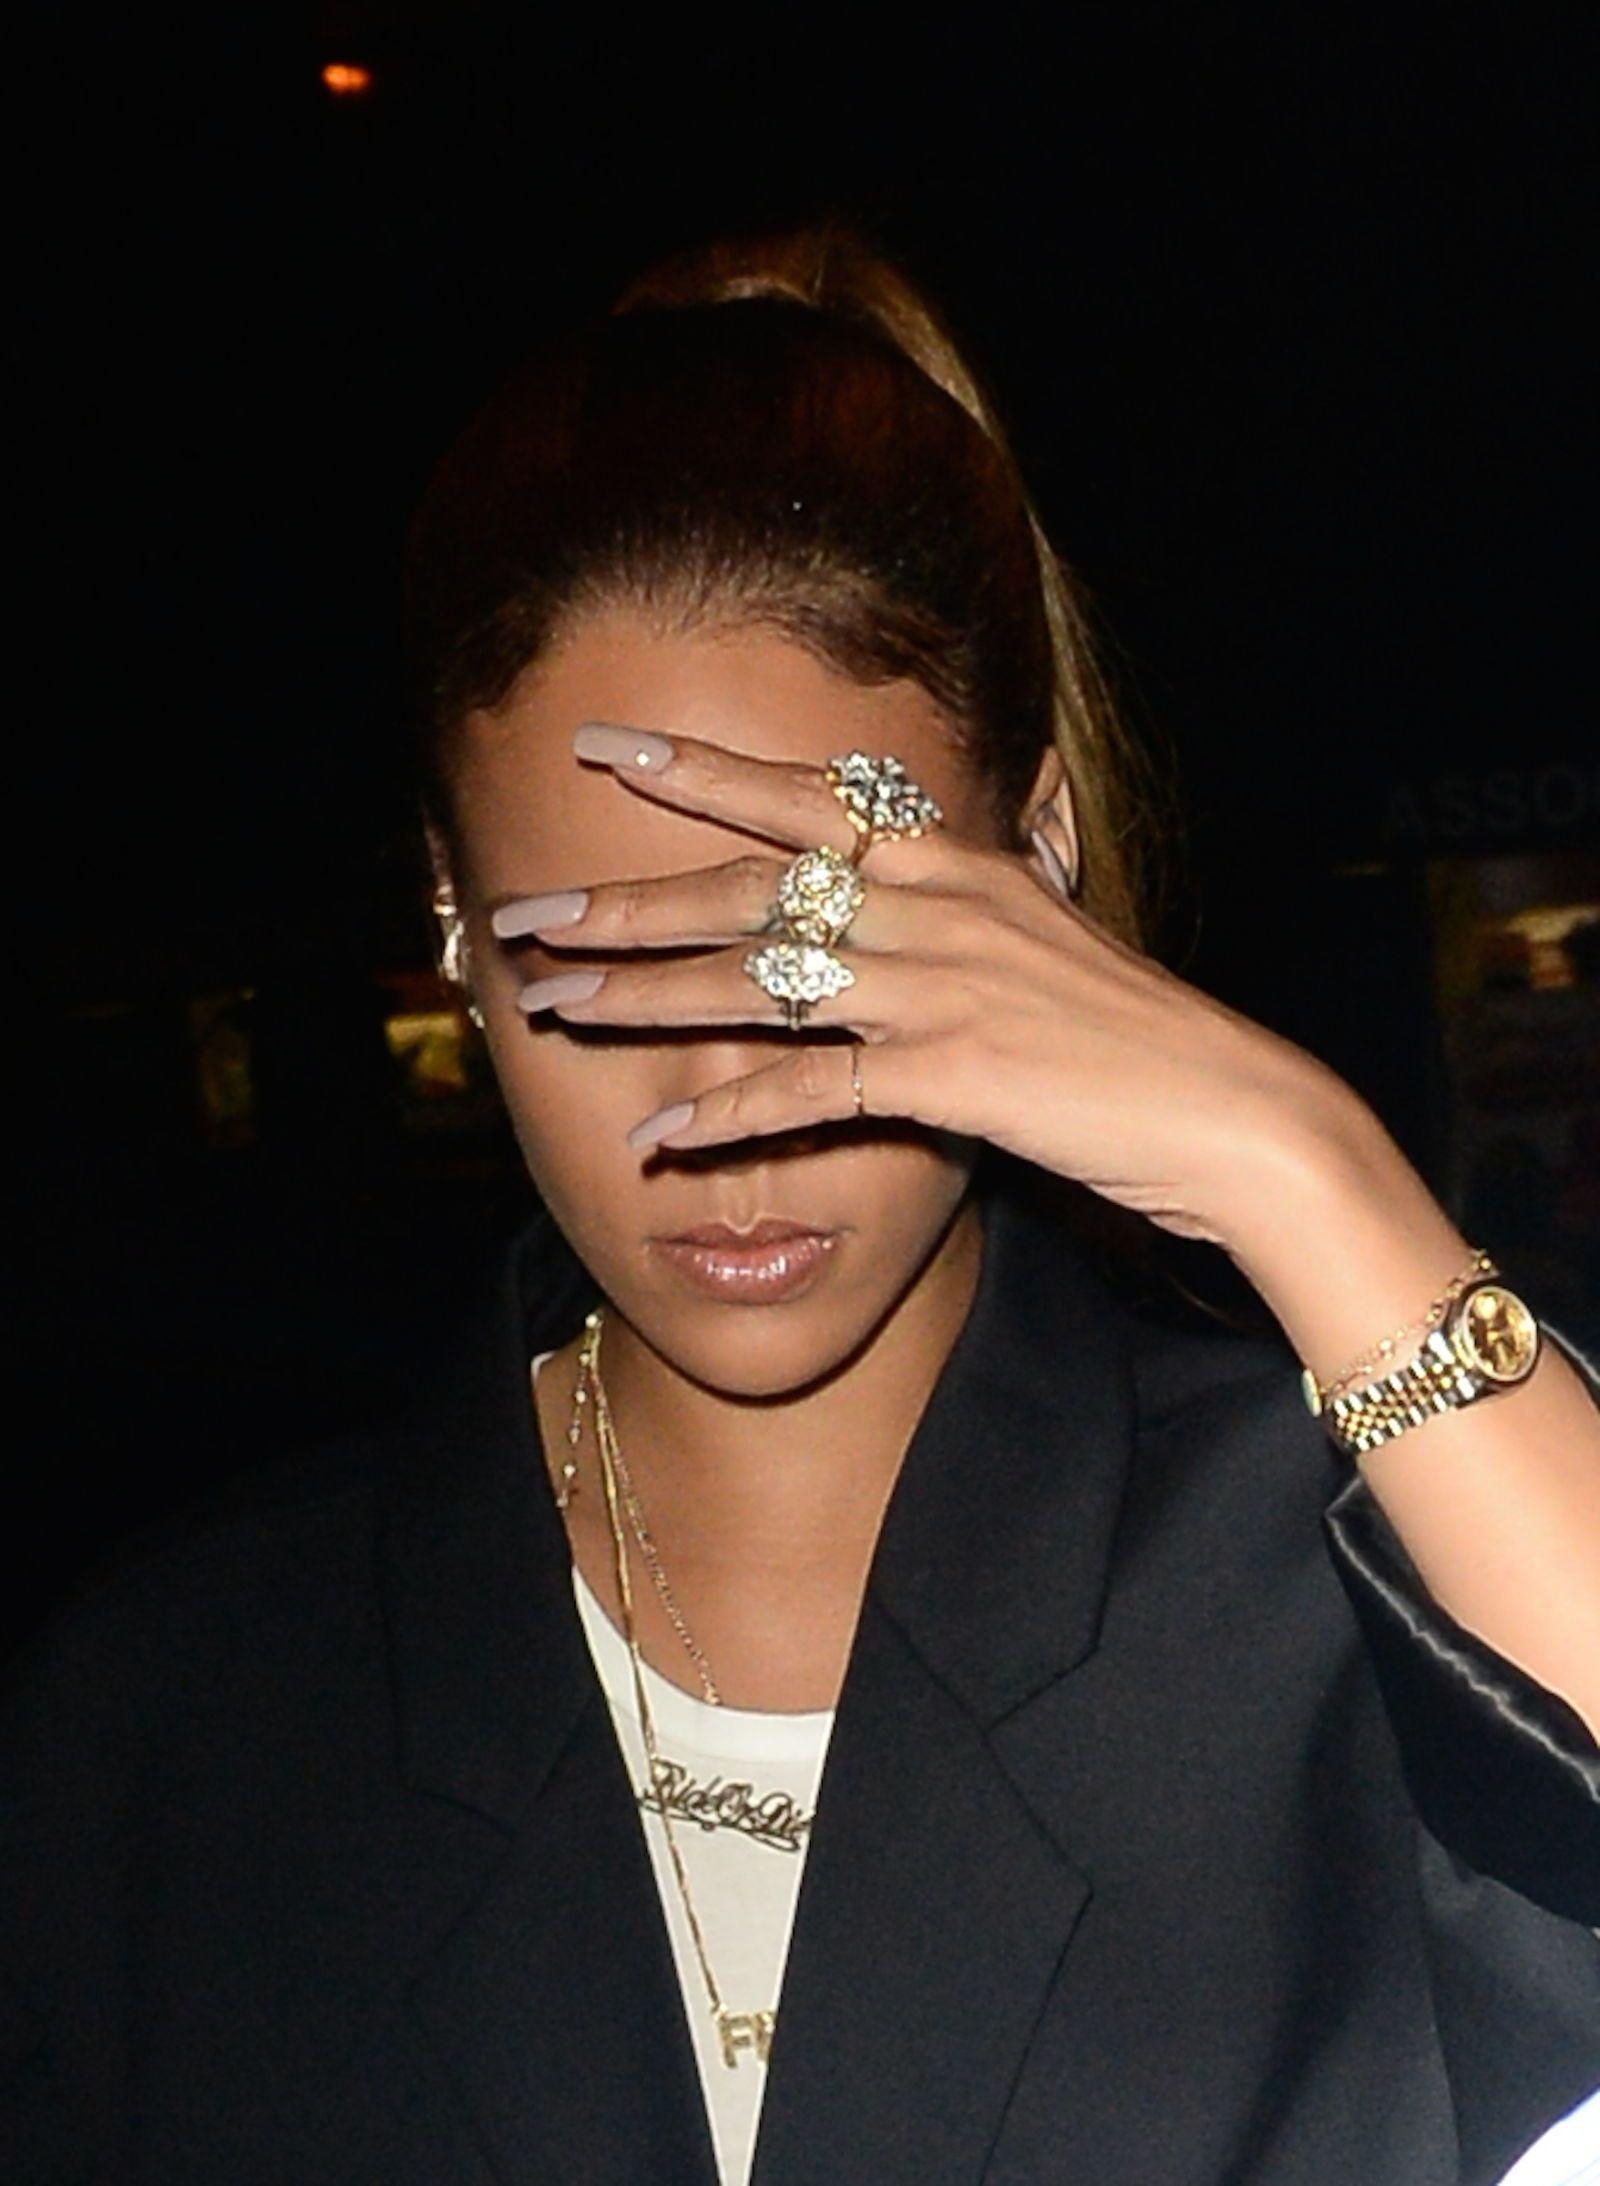 Feign A Migraine Elle Rhianna Nails Nail Ring Celebrity